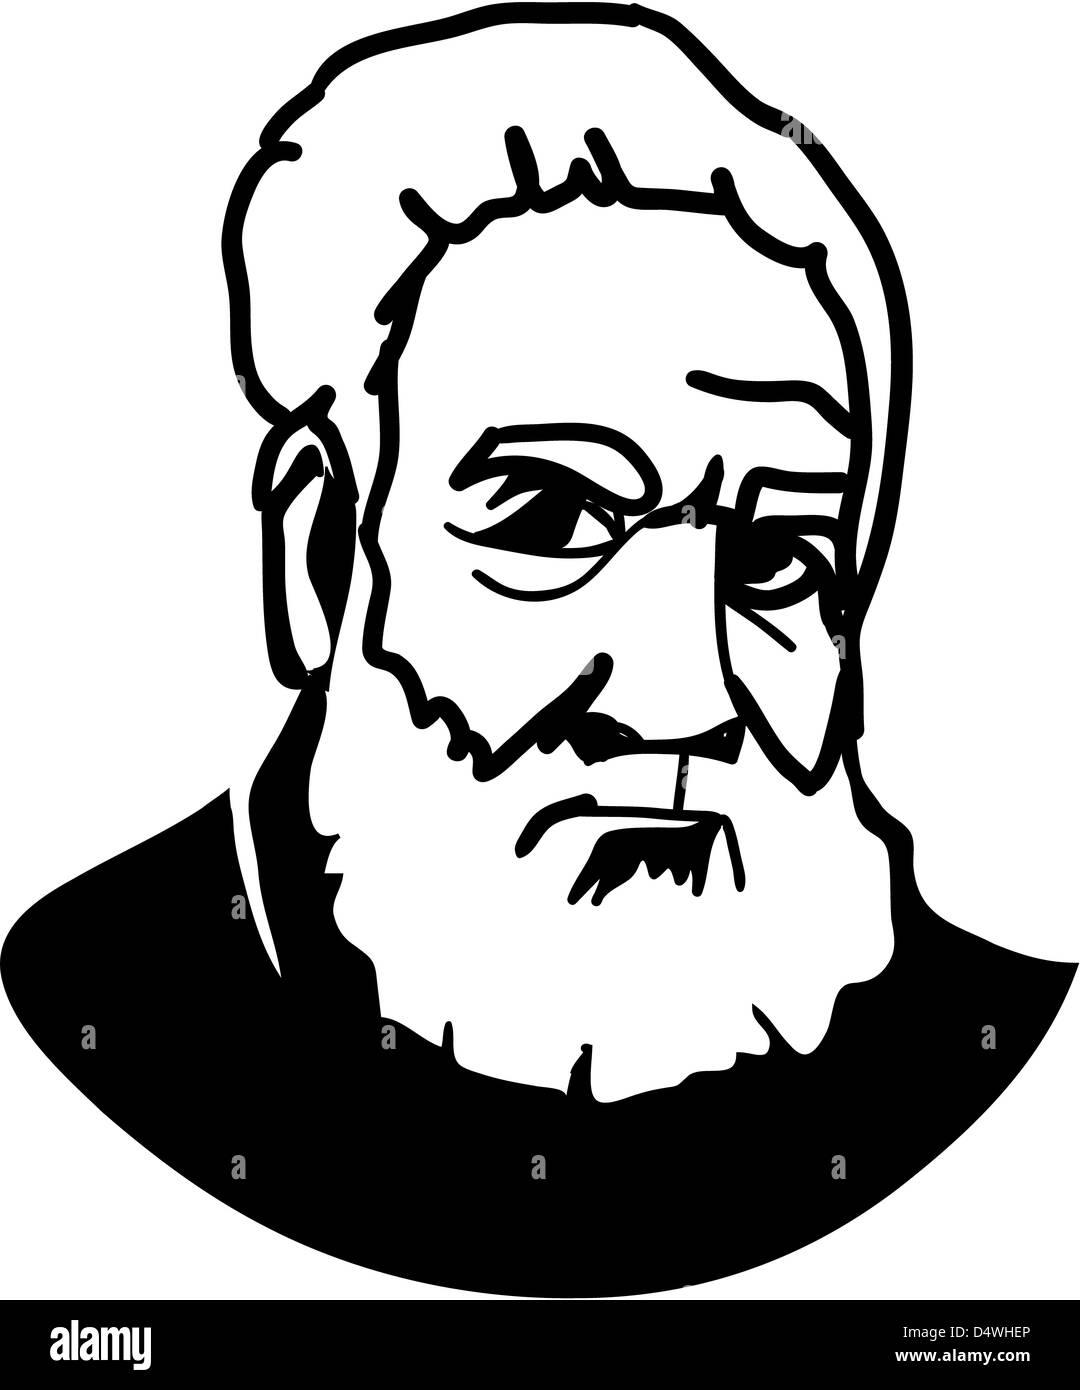 Alexander Graham Bell - American Inventor of telephone Stock Photo ...